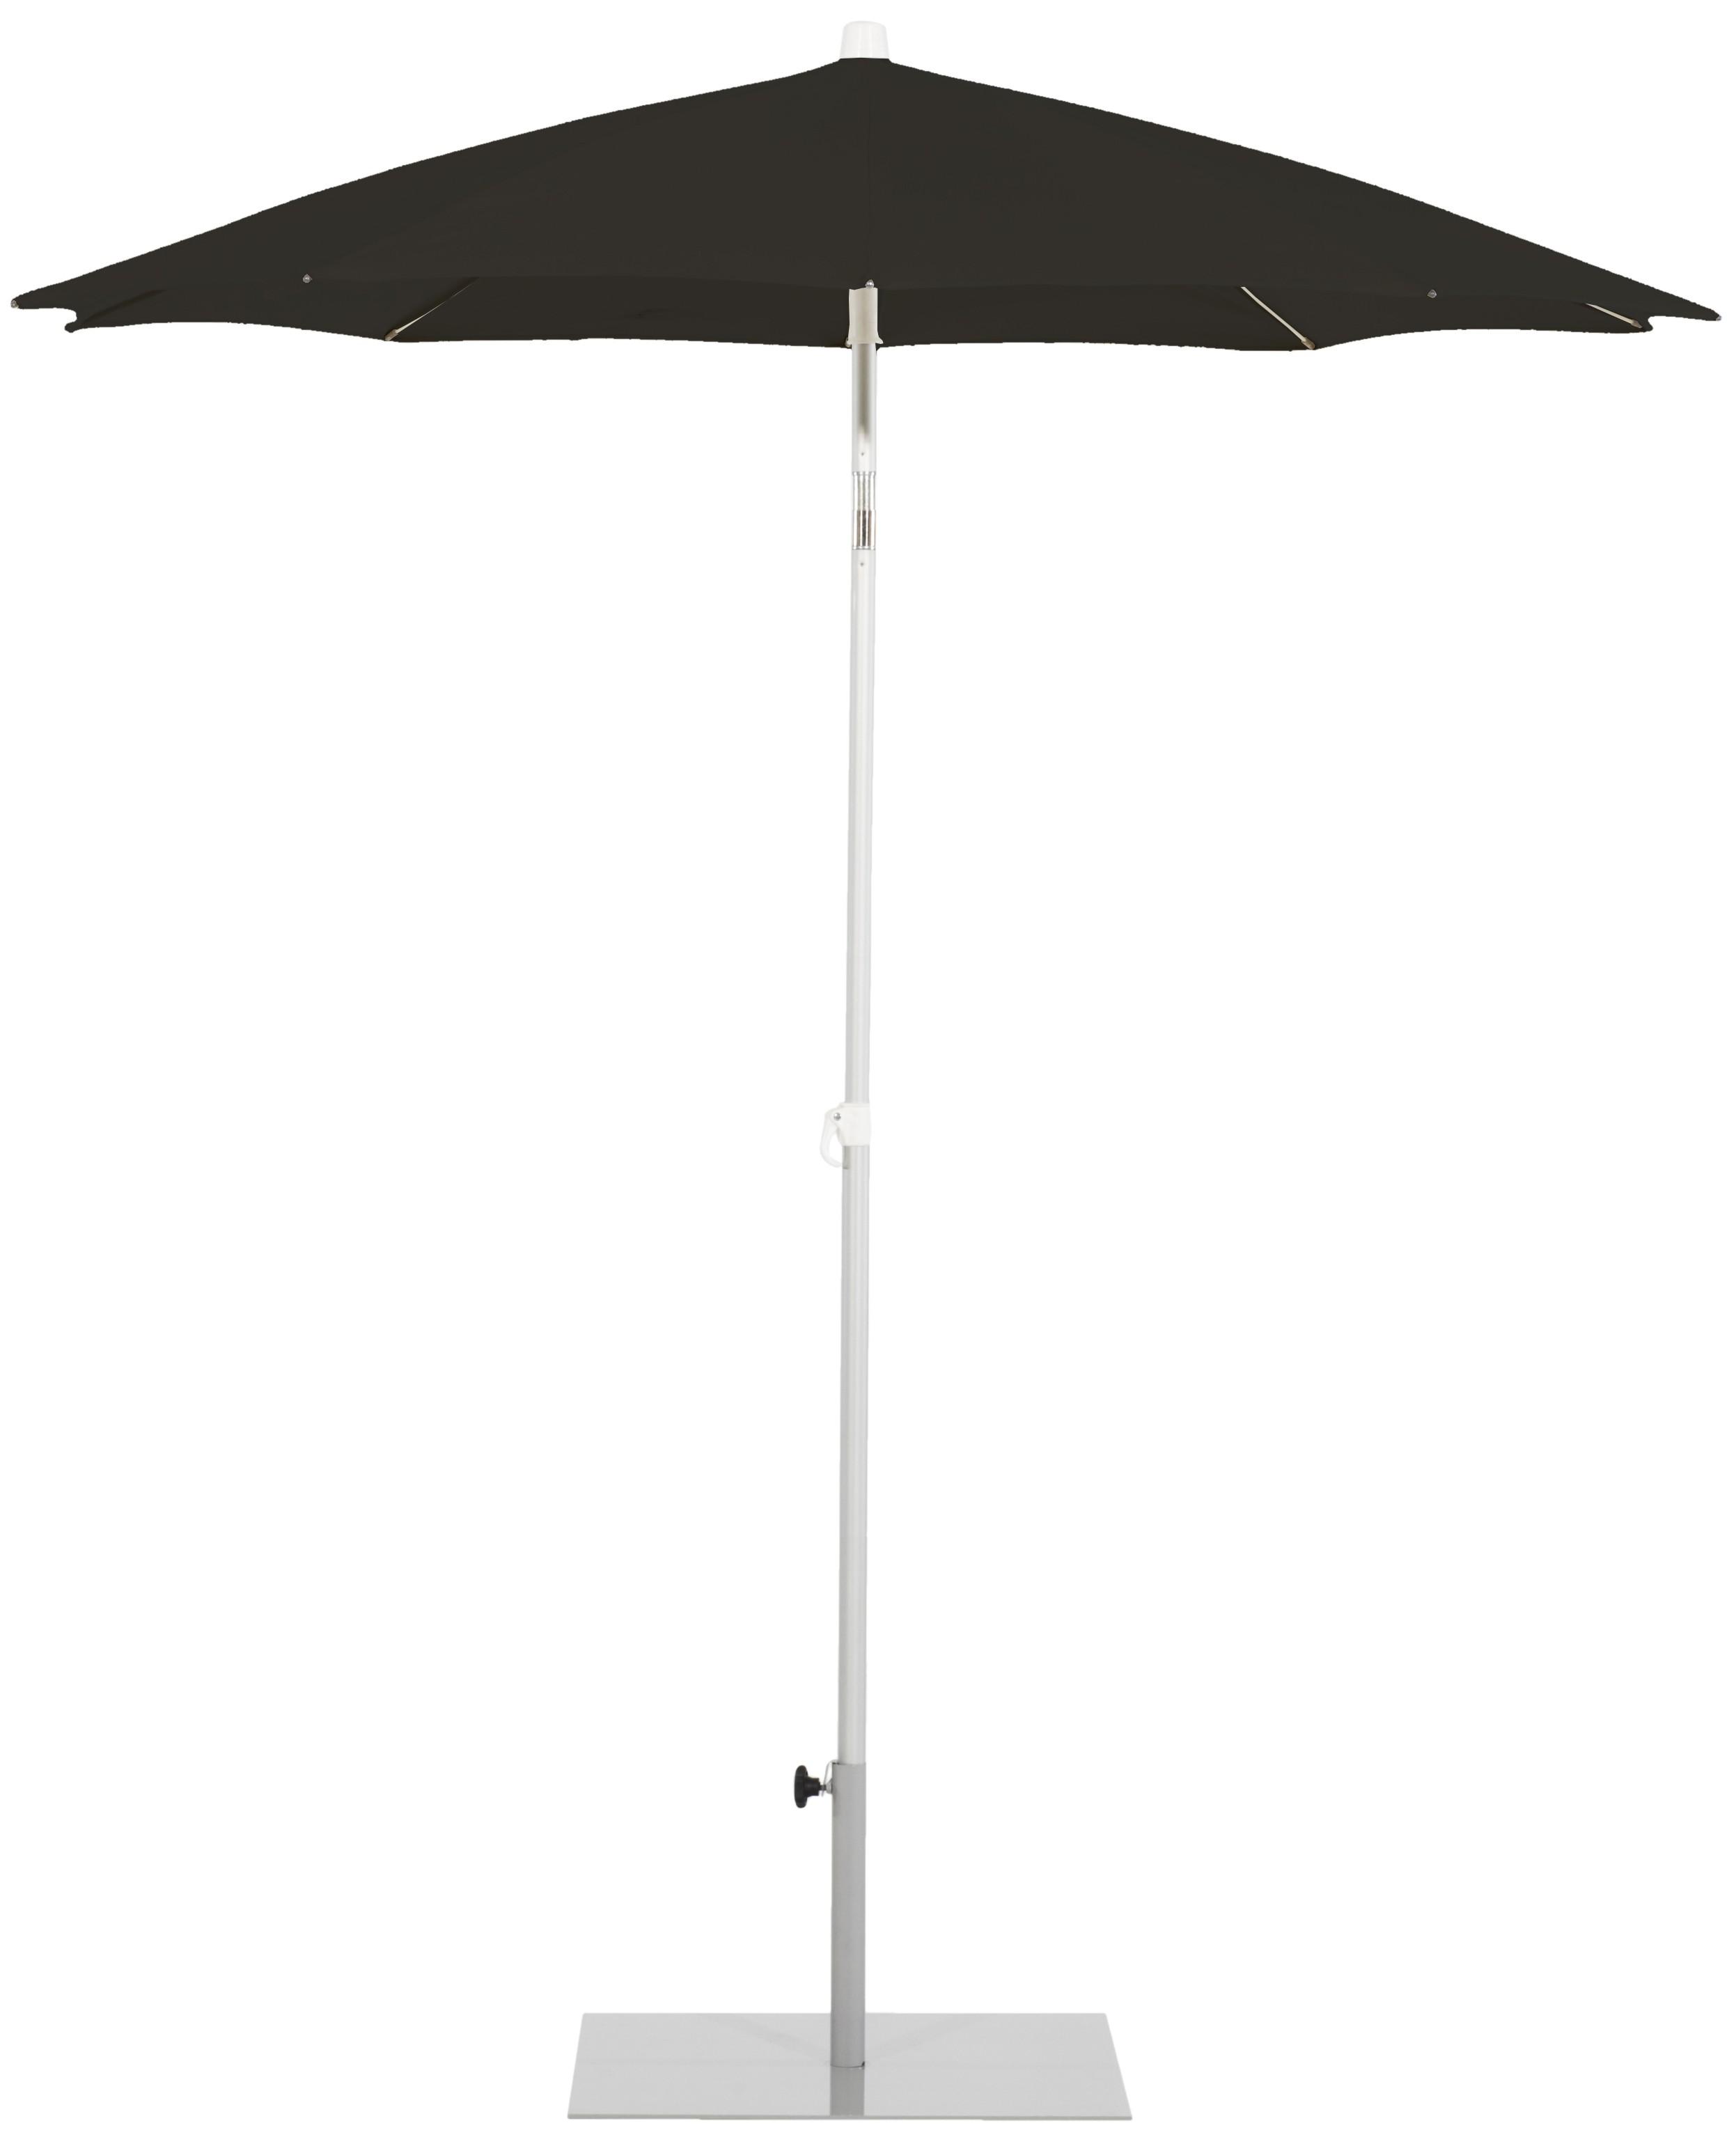 Parasol Ezpeleta Redondos Grey 0 Grises black Olefin 2